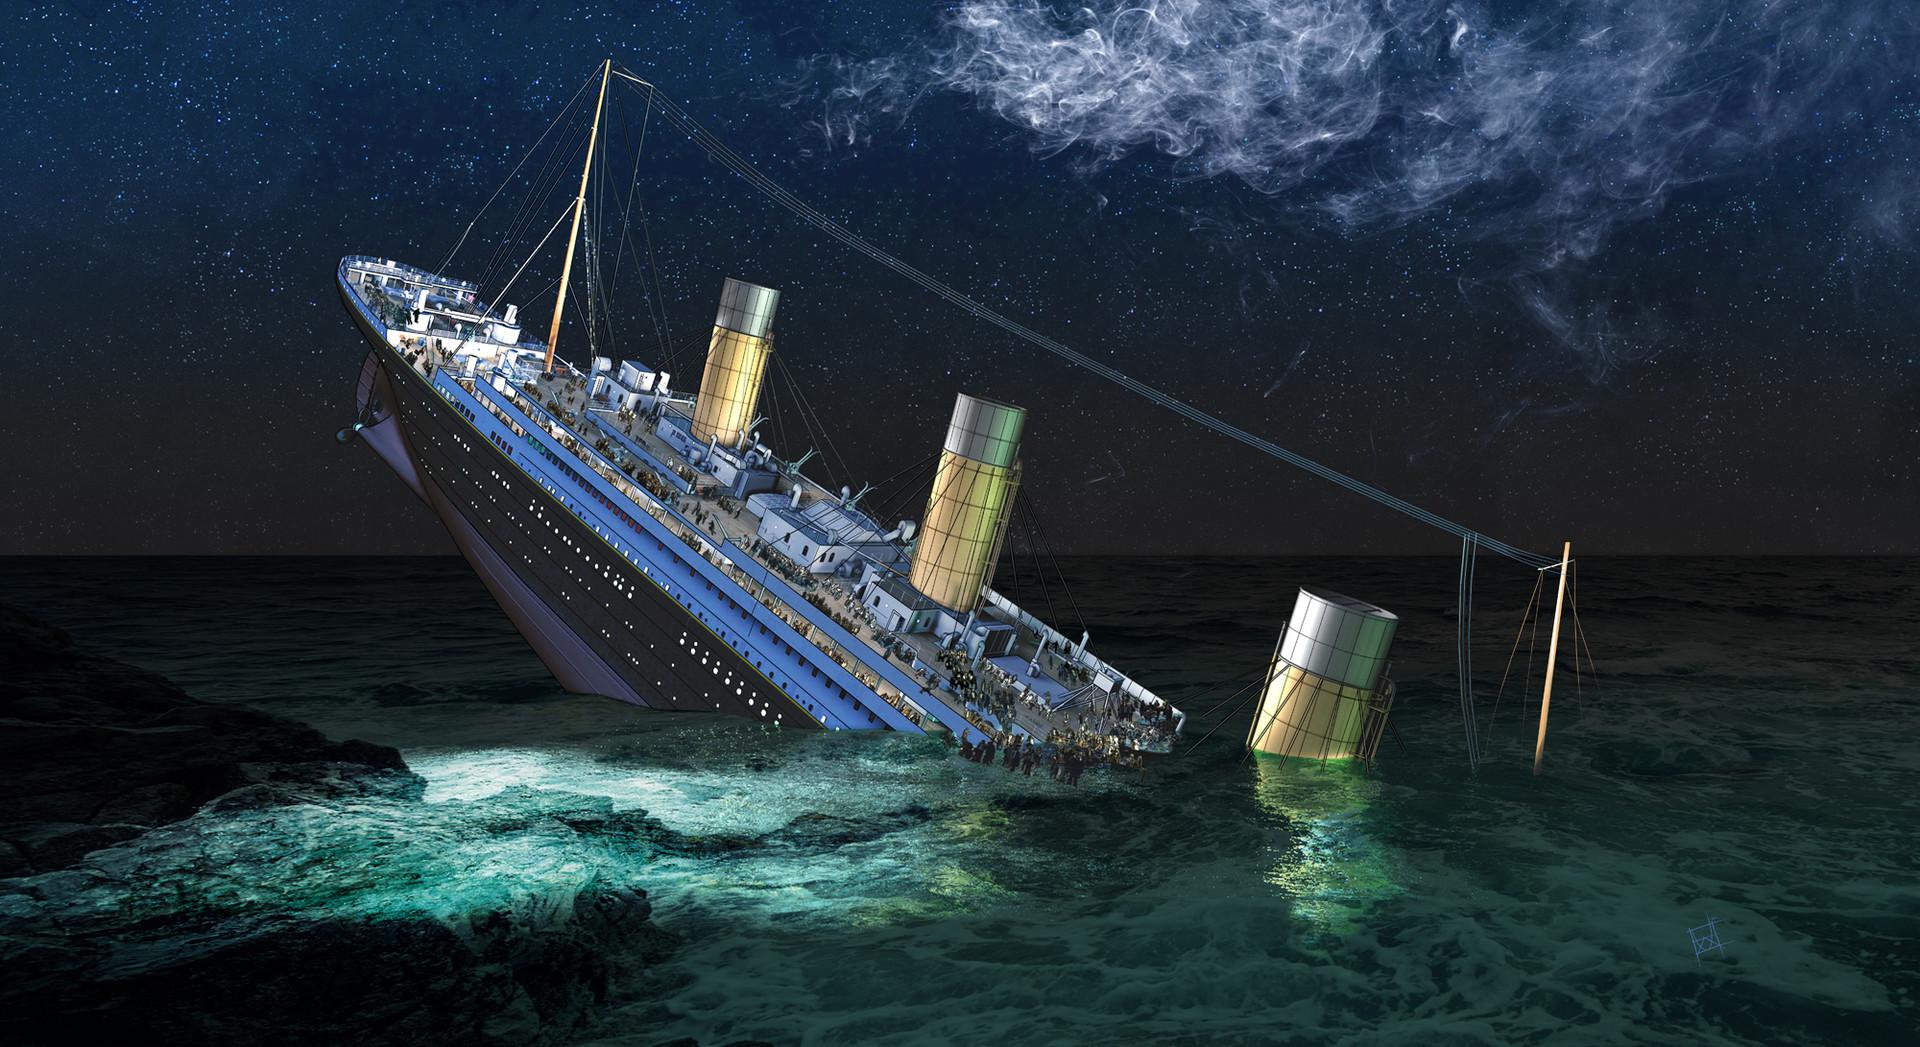 ArtStation - Titanic Sinking Concept Environment Art, Dimitar Katsarov